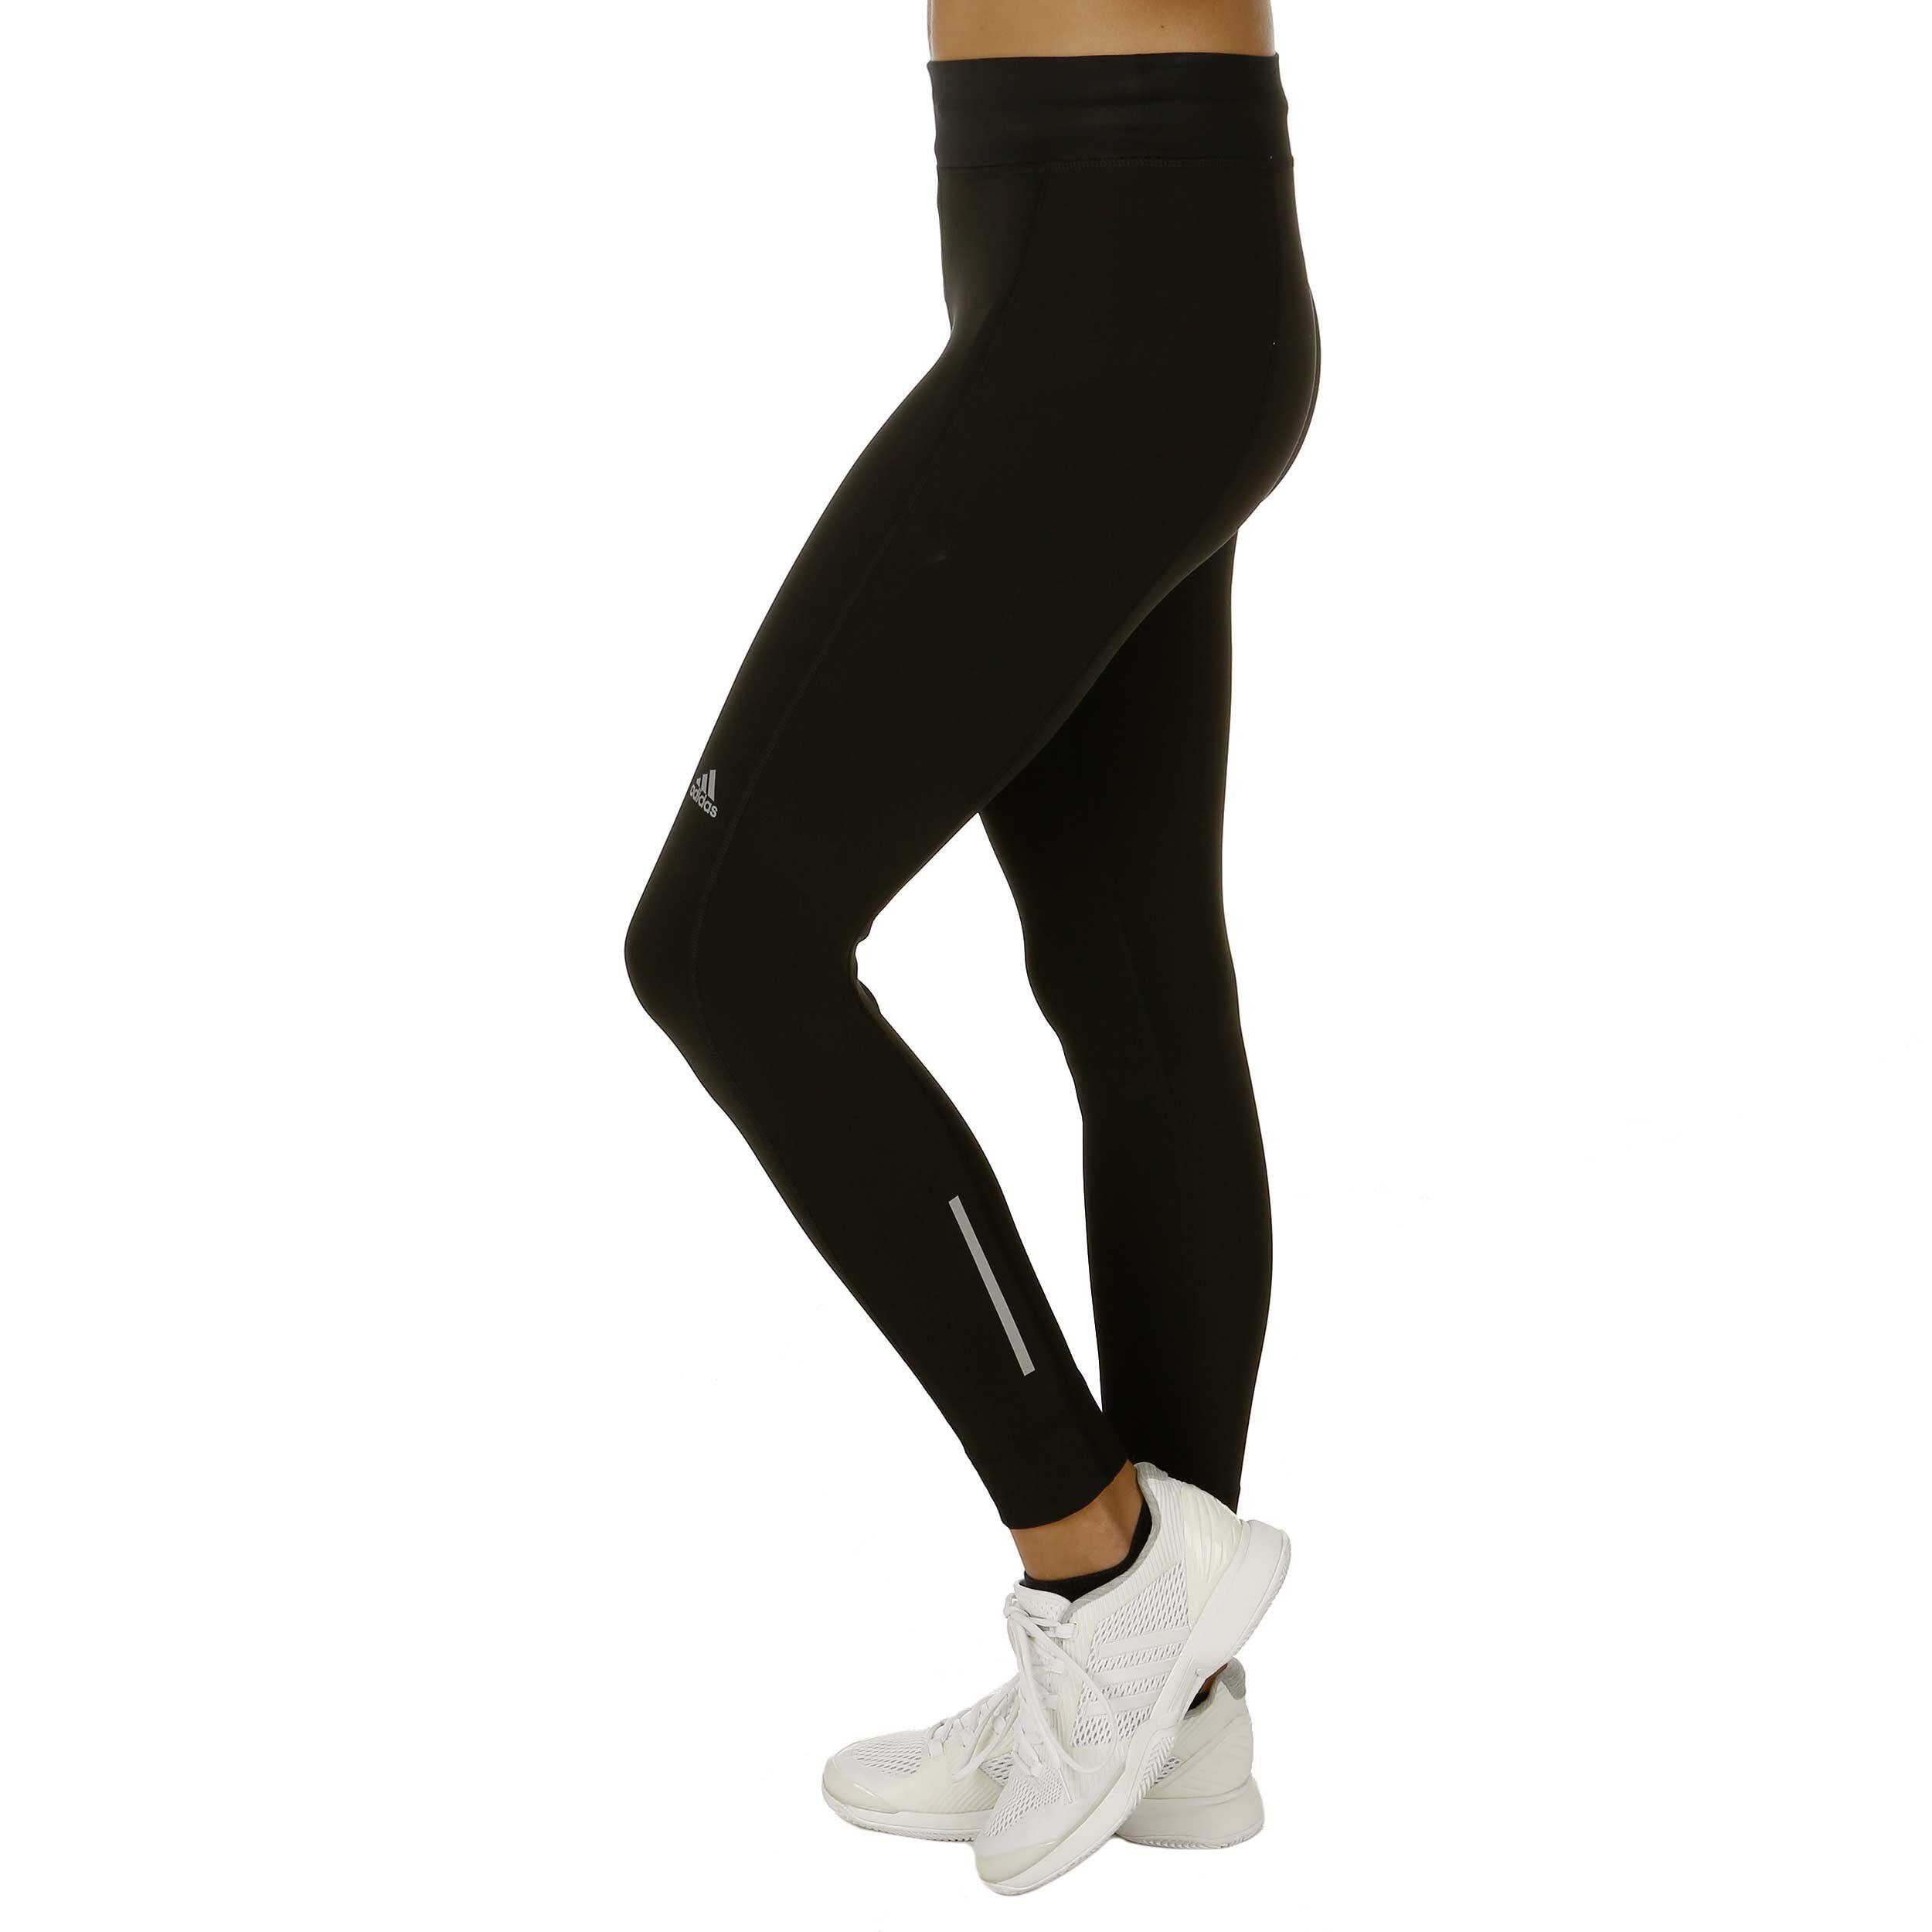 Damen Reebok Damen Workout Fitted Tight Hose Laufhose